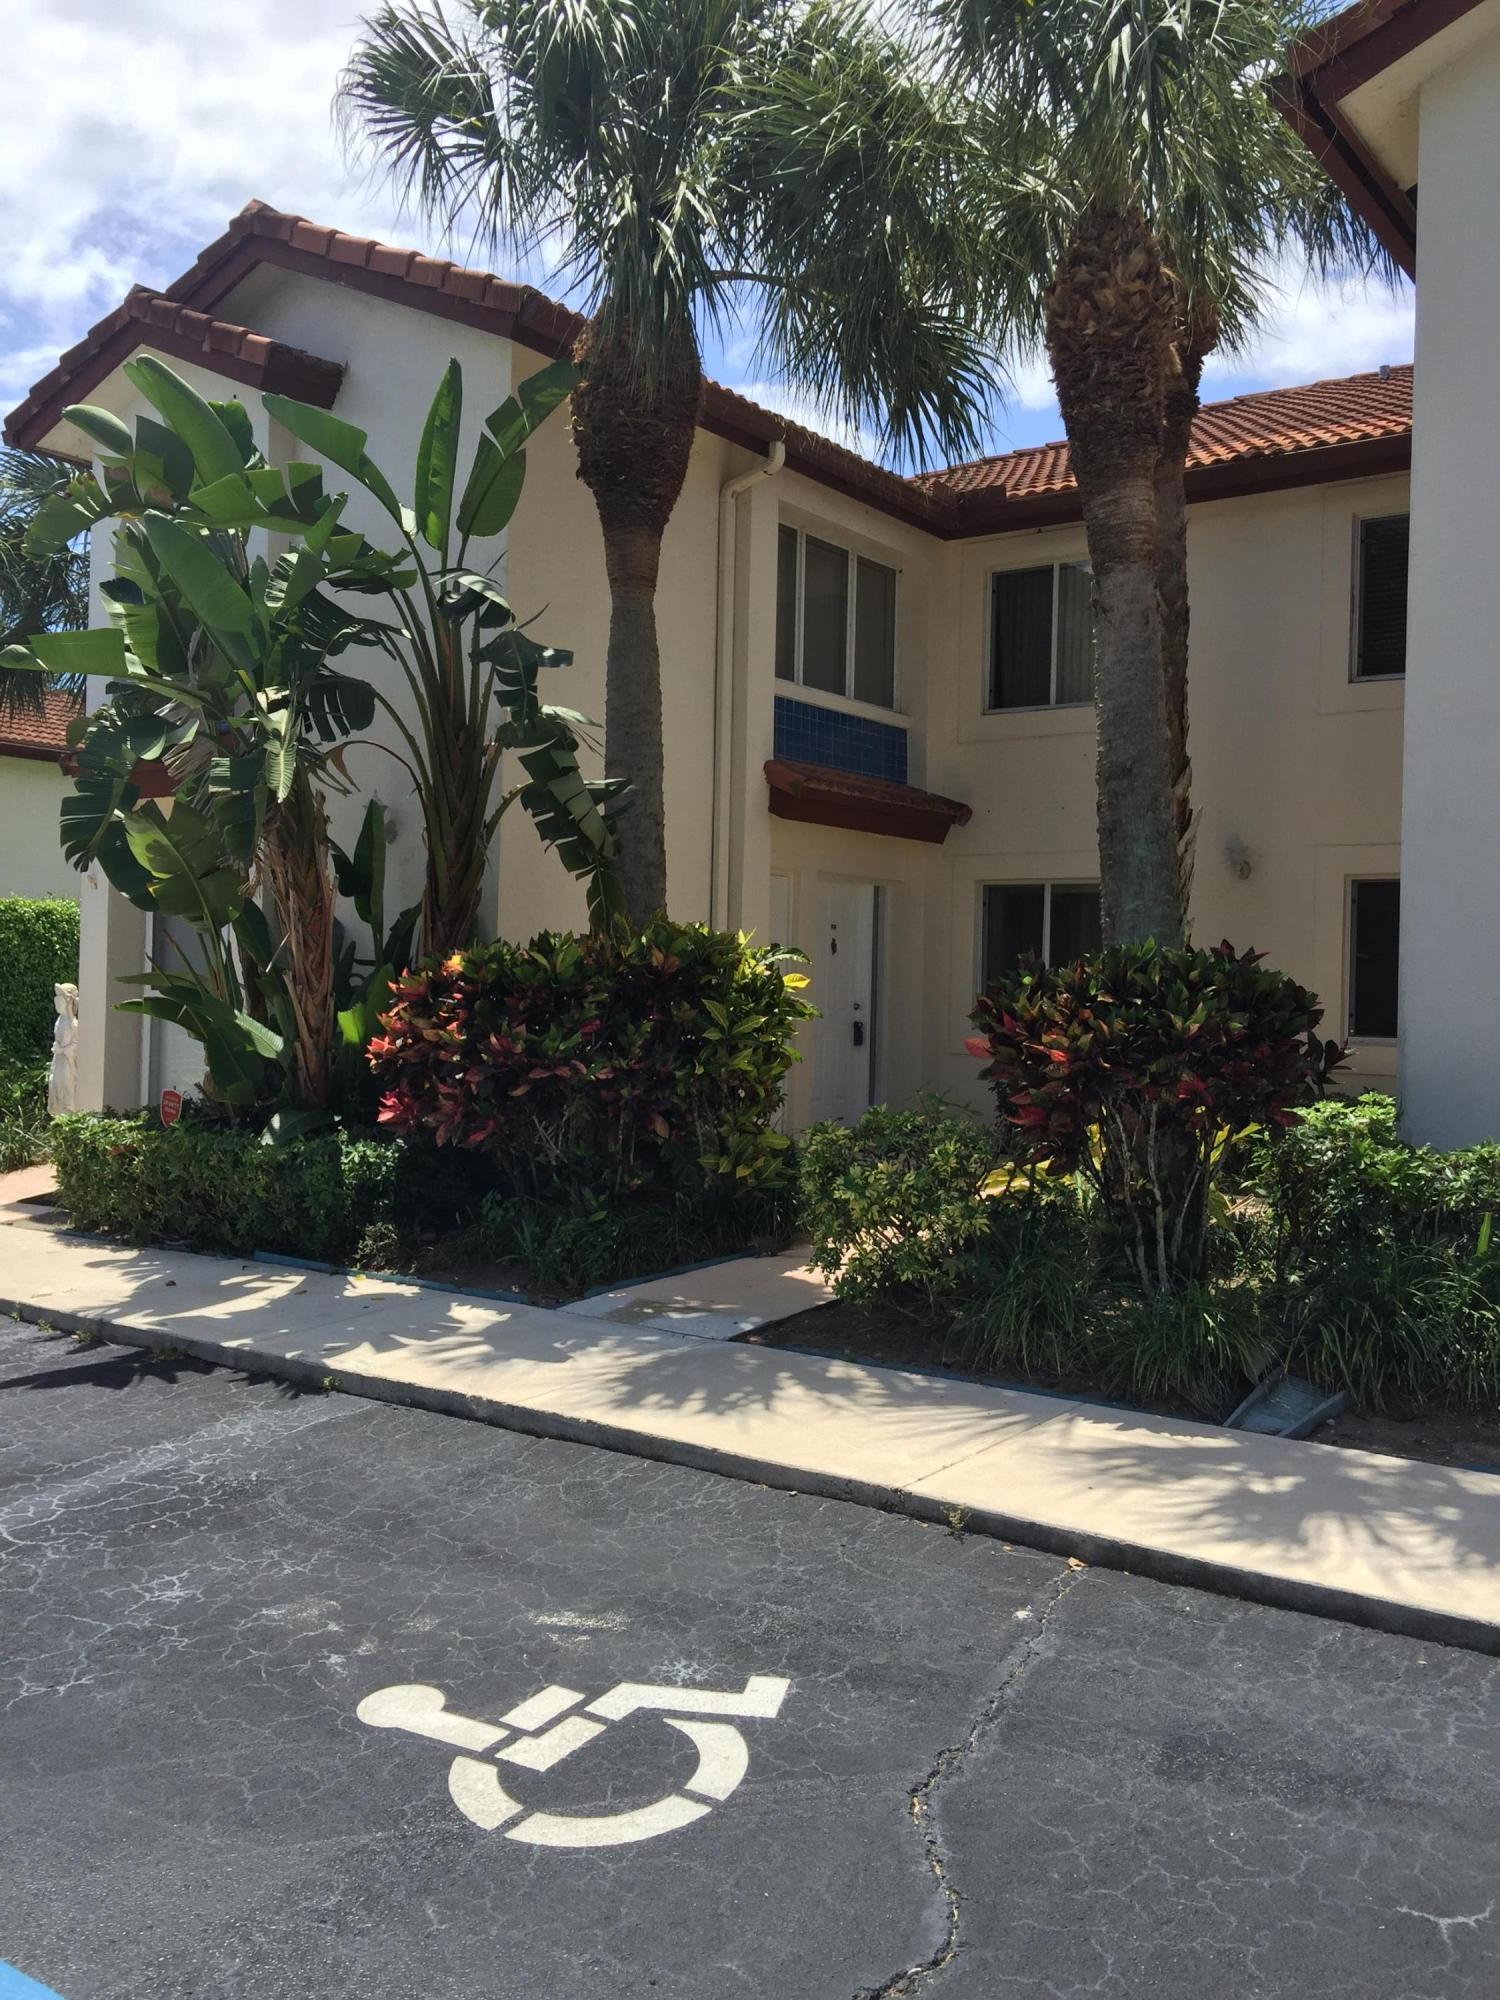 330 NW 67TH Street #d101 Boca Raton, FL 33487